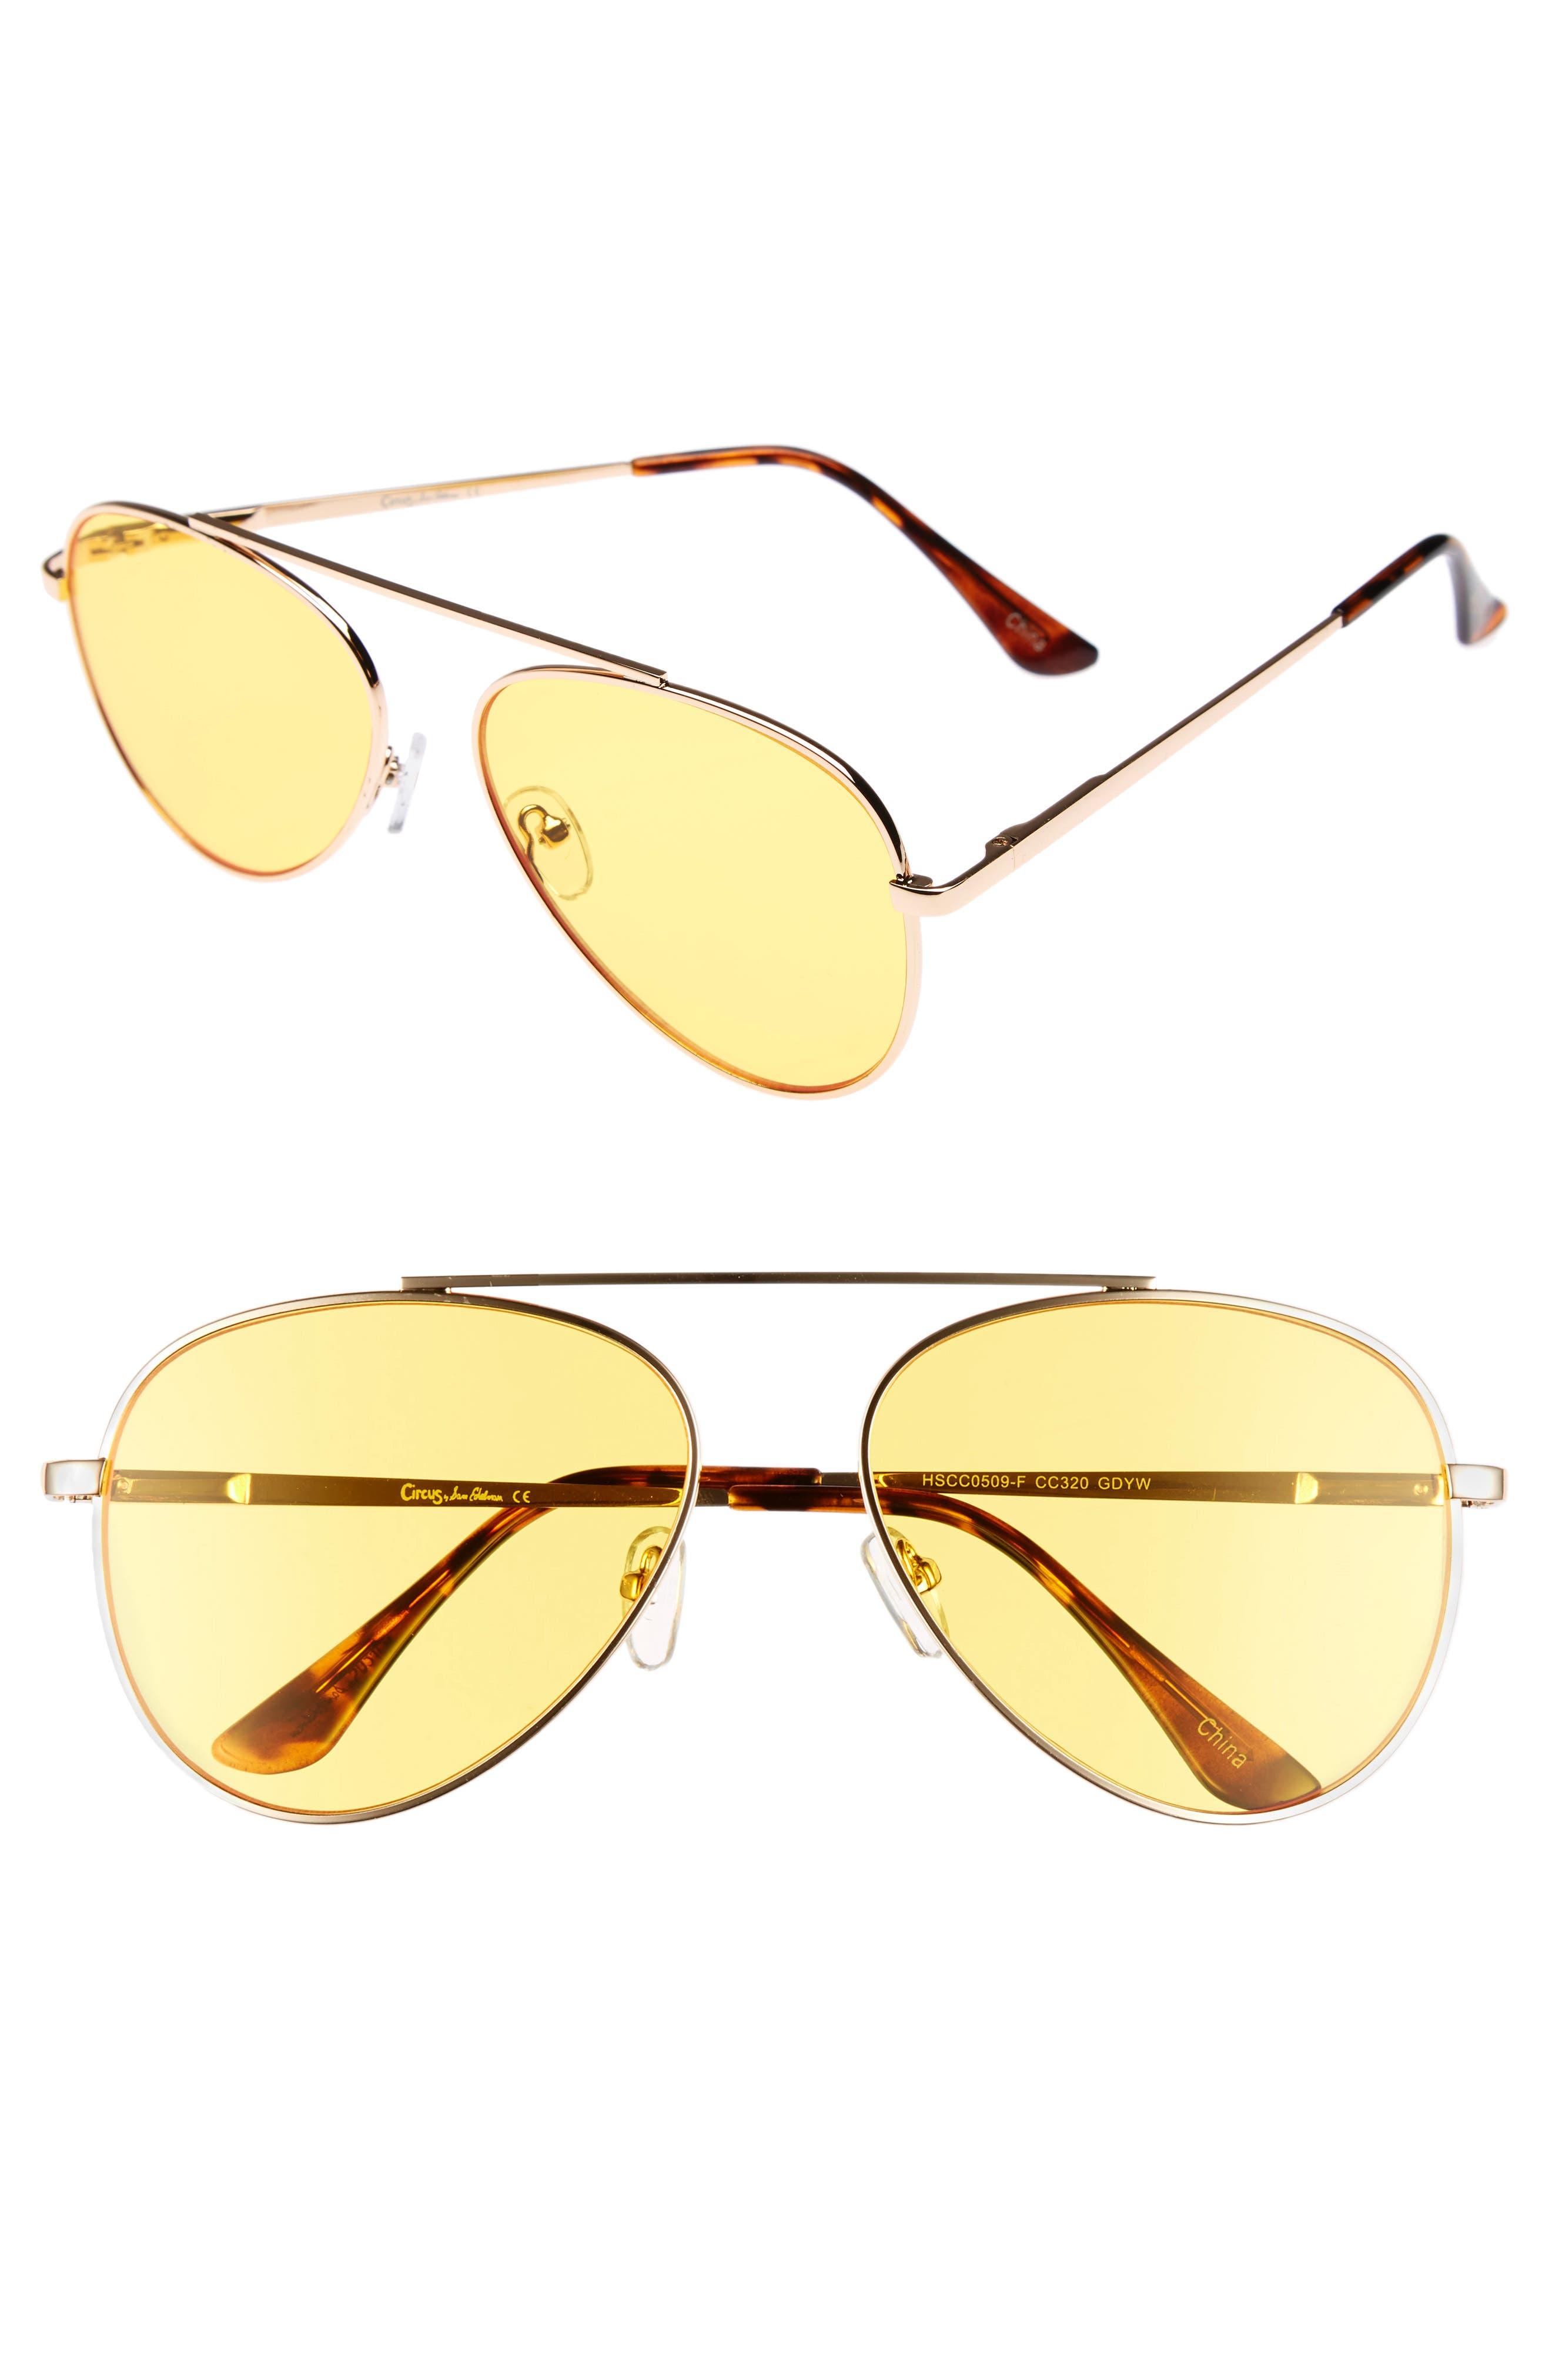 58mm Aviator Sunglasses,                         Main,                         color, Gold/ Yellow